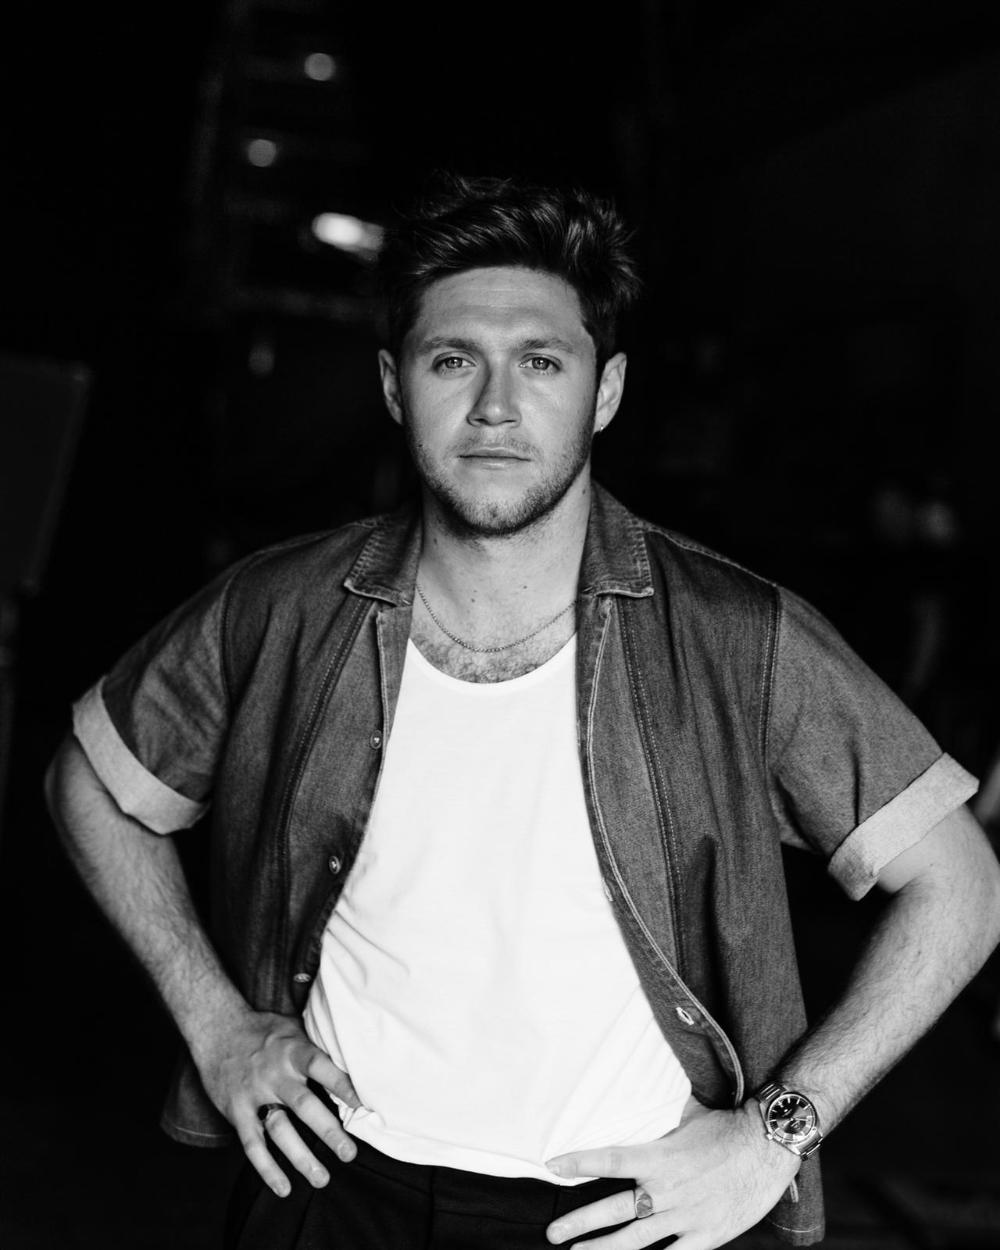 Niall Horan On Twitter Niall Horan Baby Niall Horan Niall Horan Lyrics